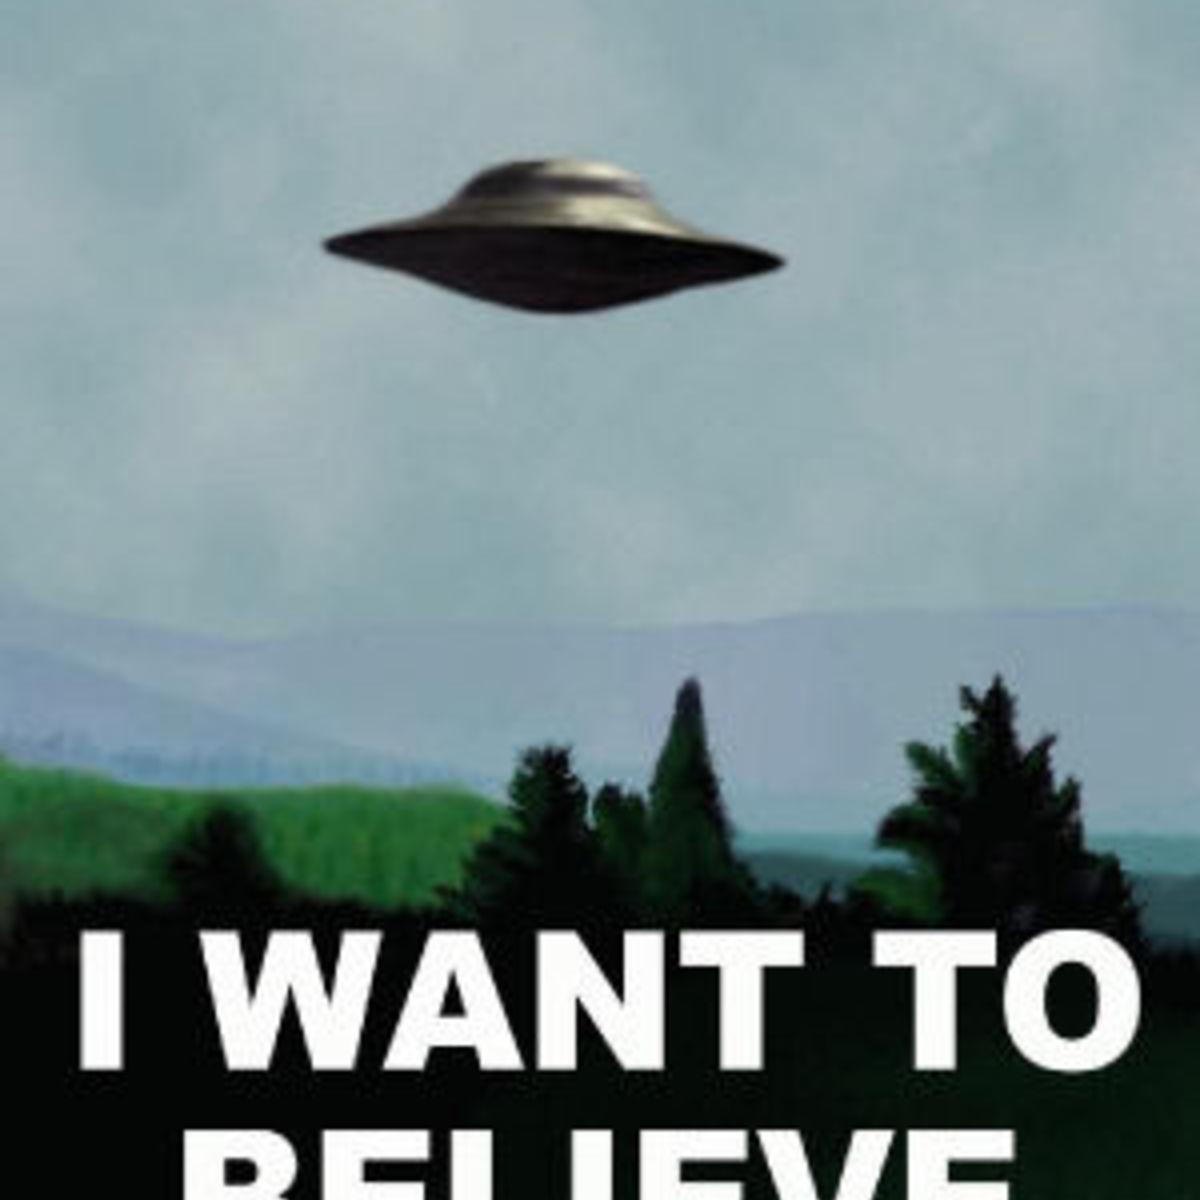 X_Files_I_want_to_believe.jpg